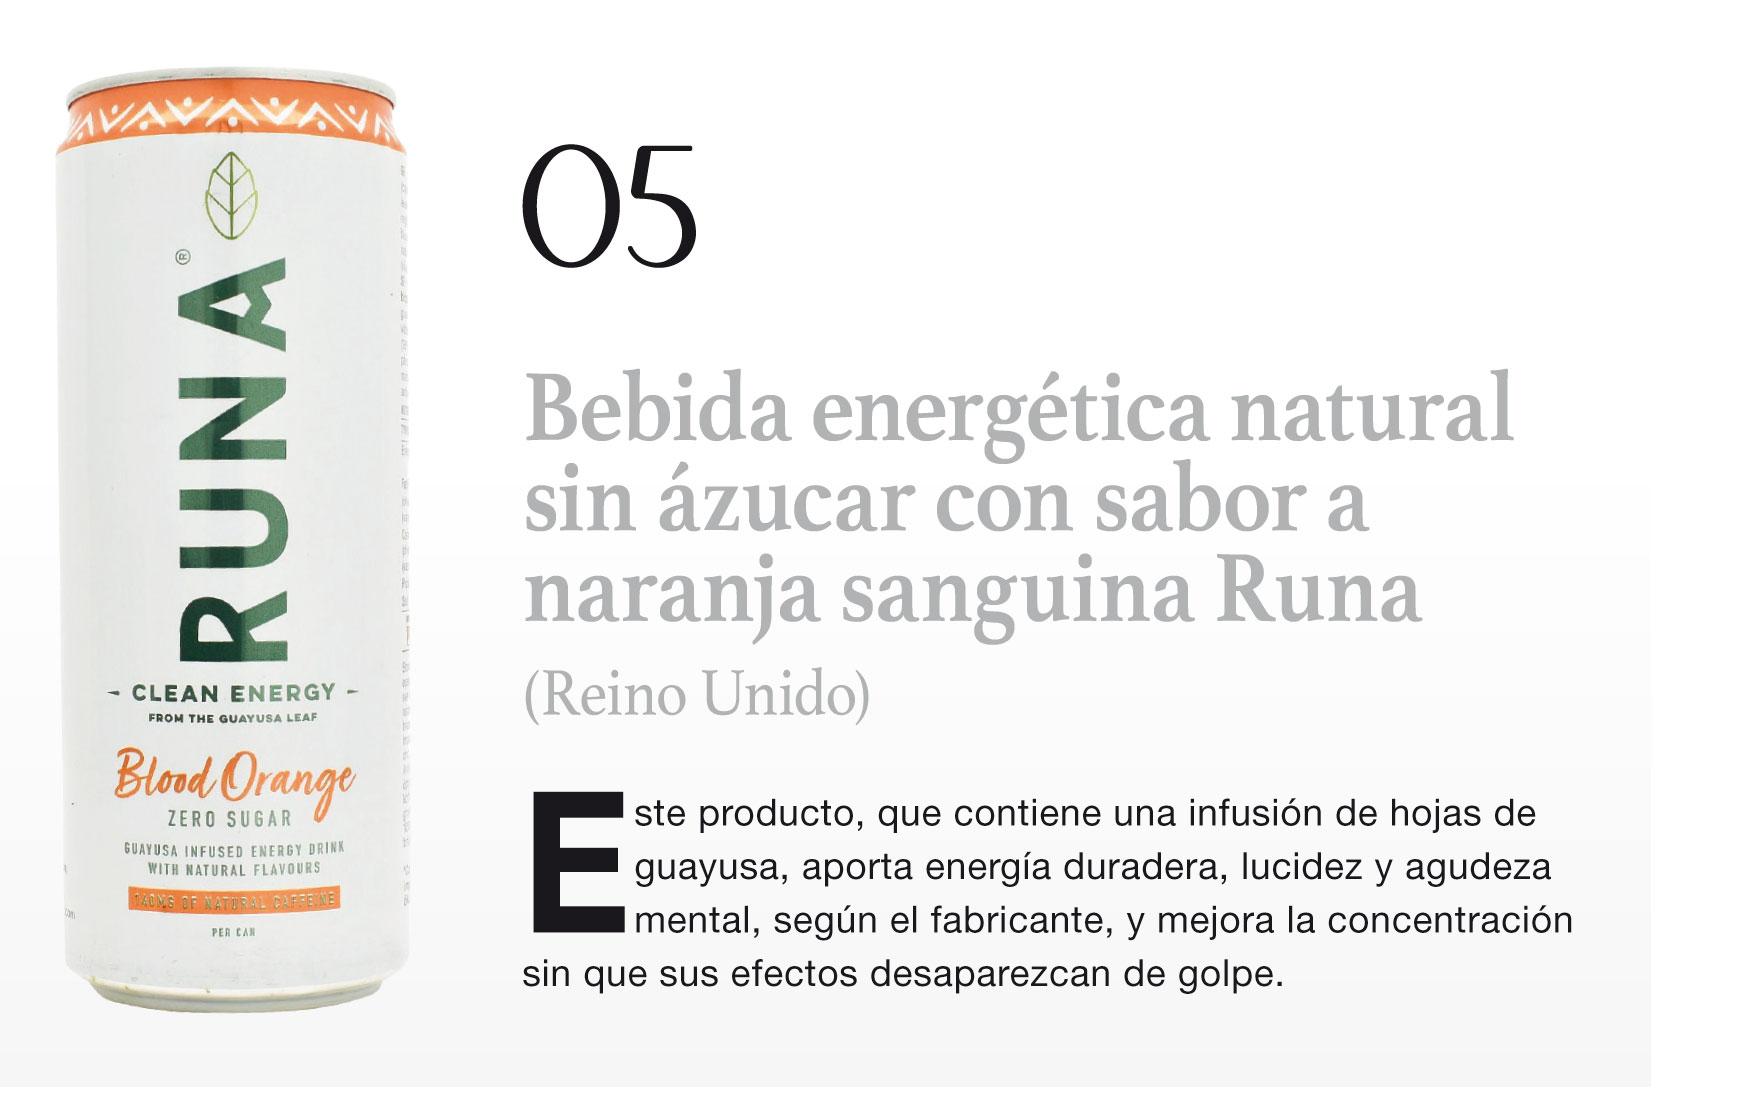 Bebida energética natural sin ázucar con sabor a naranja sanguina Runa (Reino Unido)